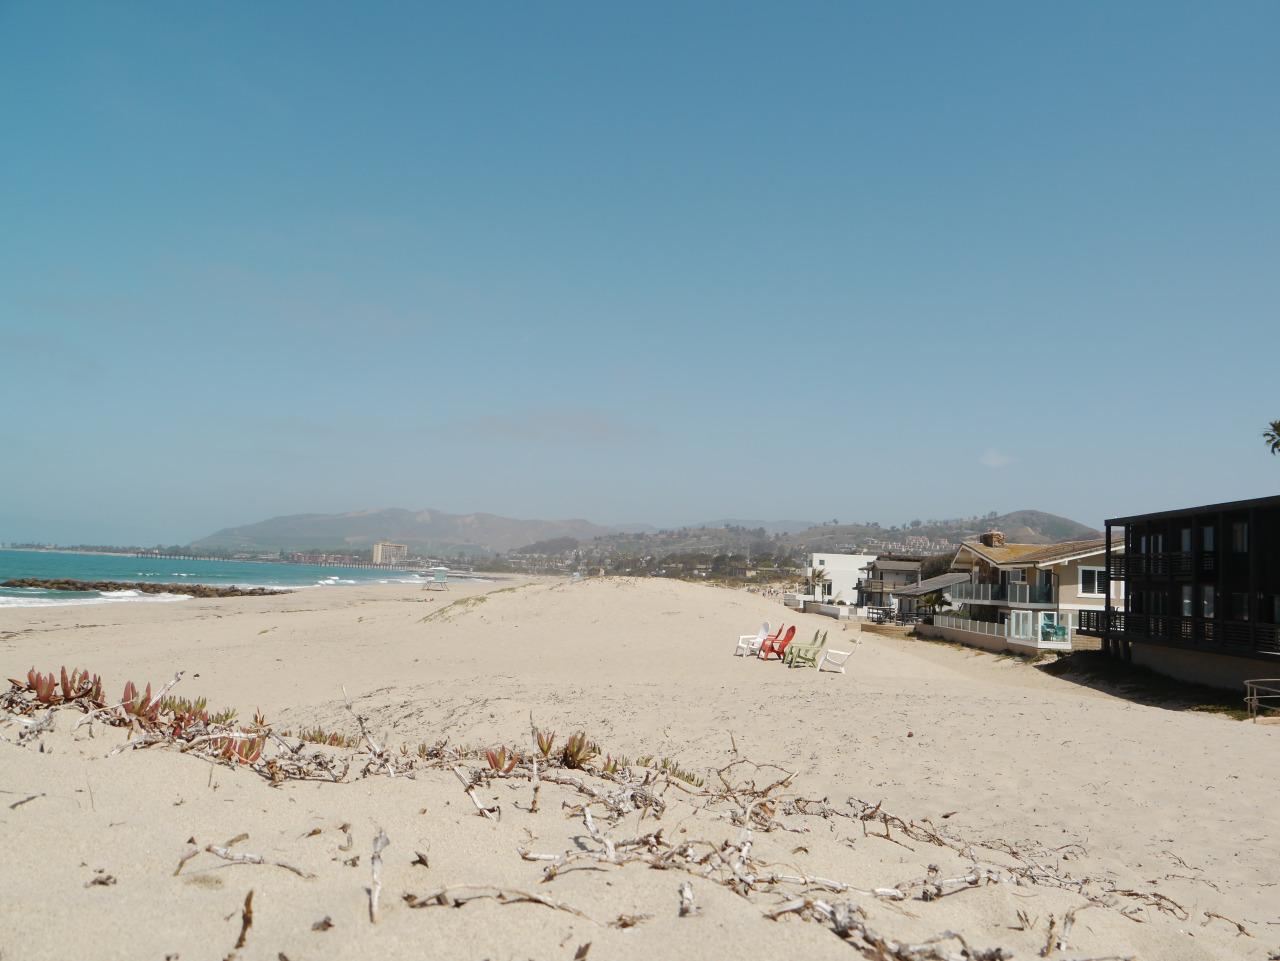 Pierpont Beach